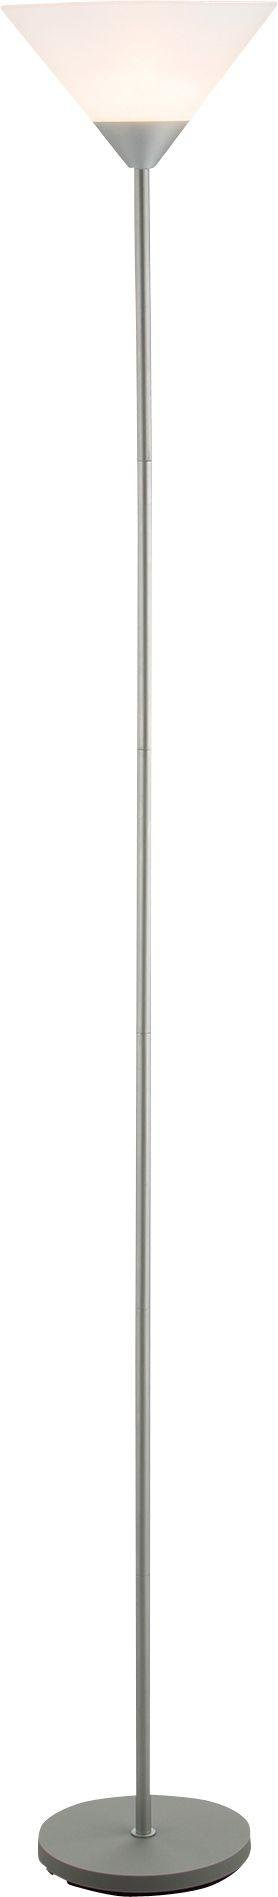 Simple Value Uplighter Floor Lamp - Silver